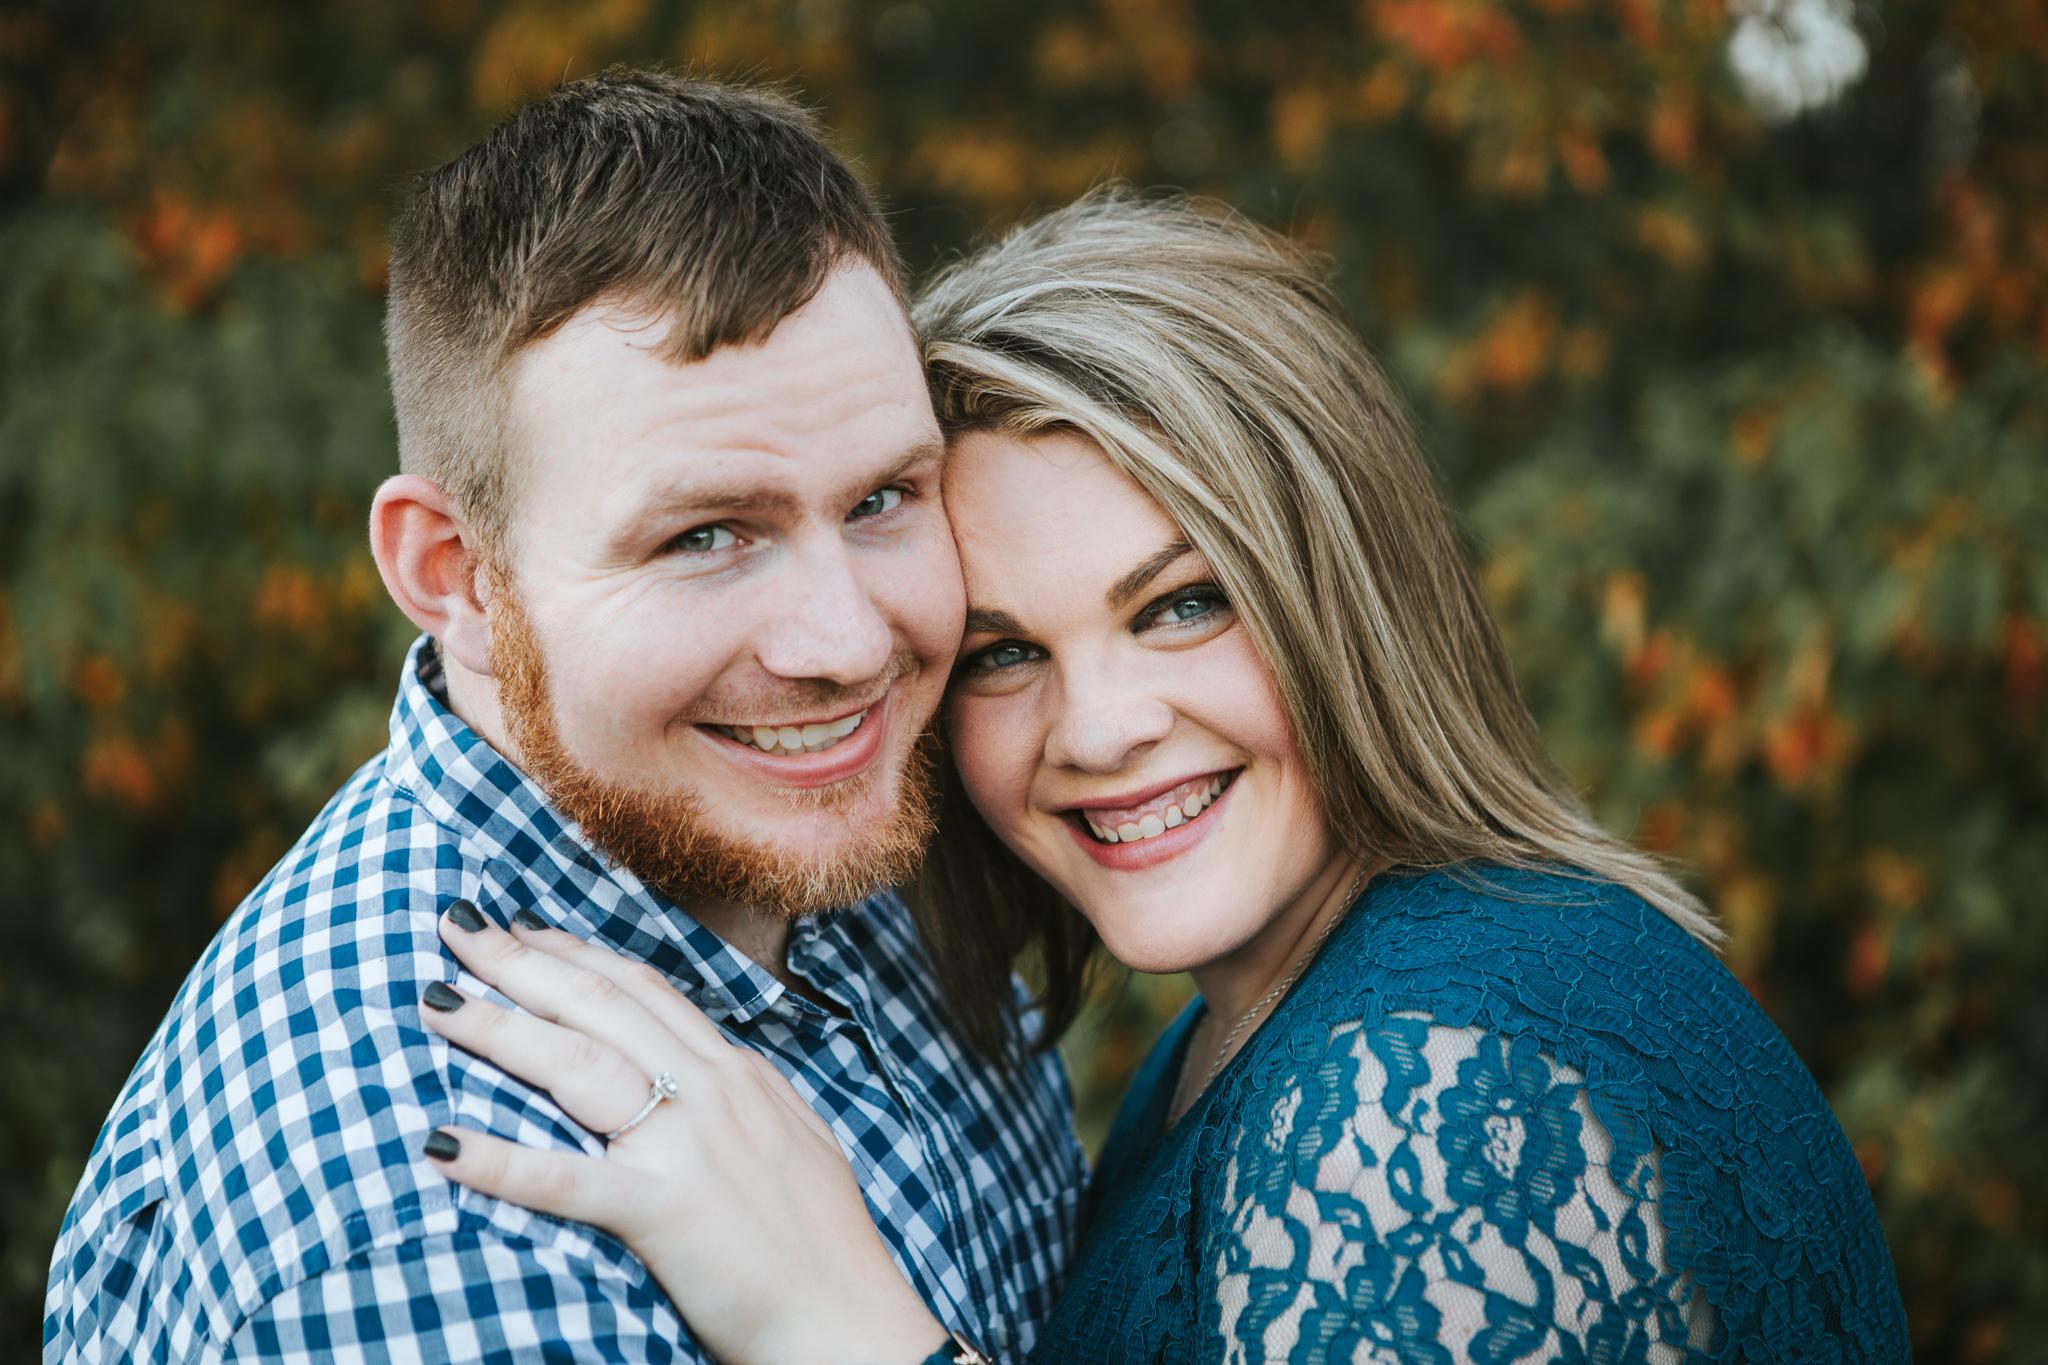 Richmond Kentucky Engagement Photographer - Ariana Jordan Photography -18.jpg